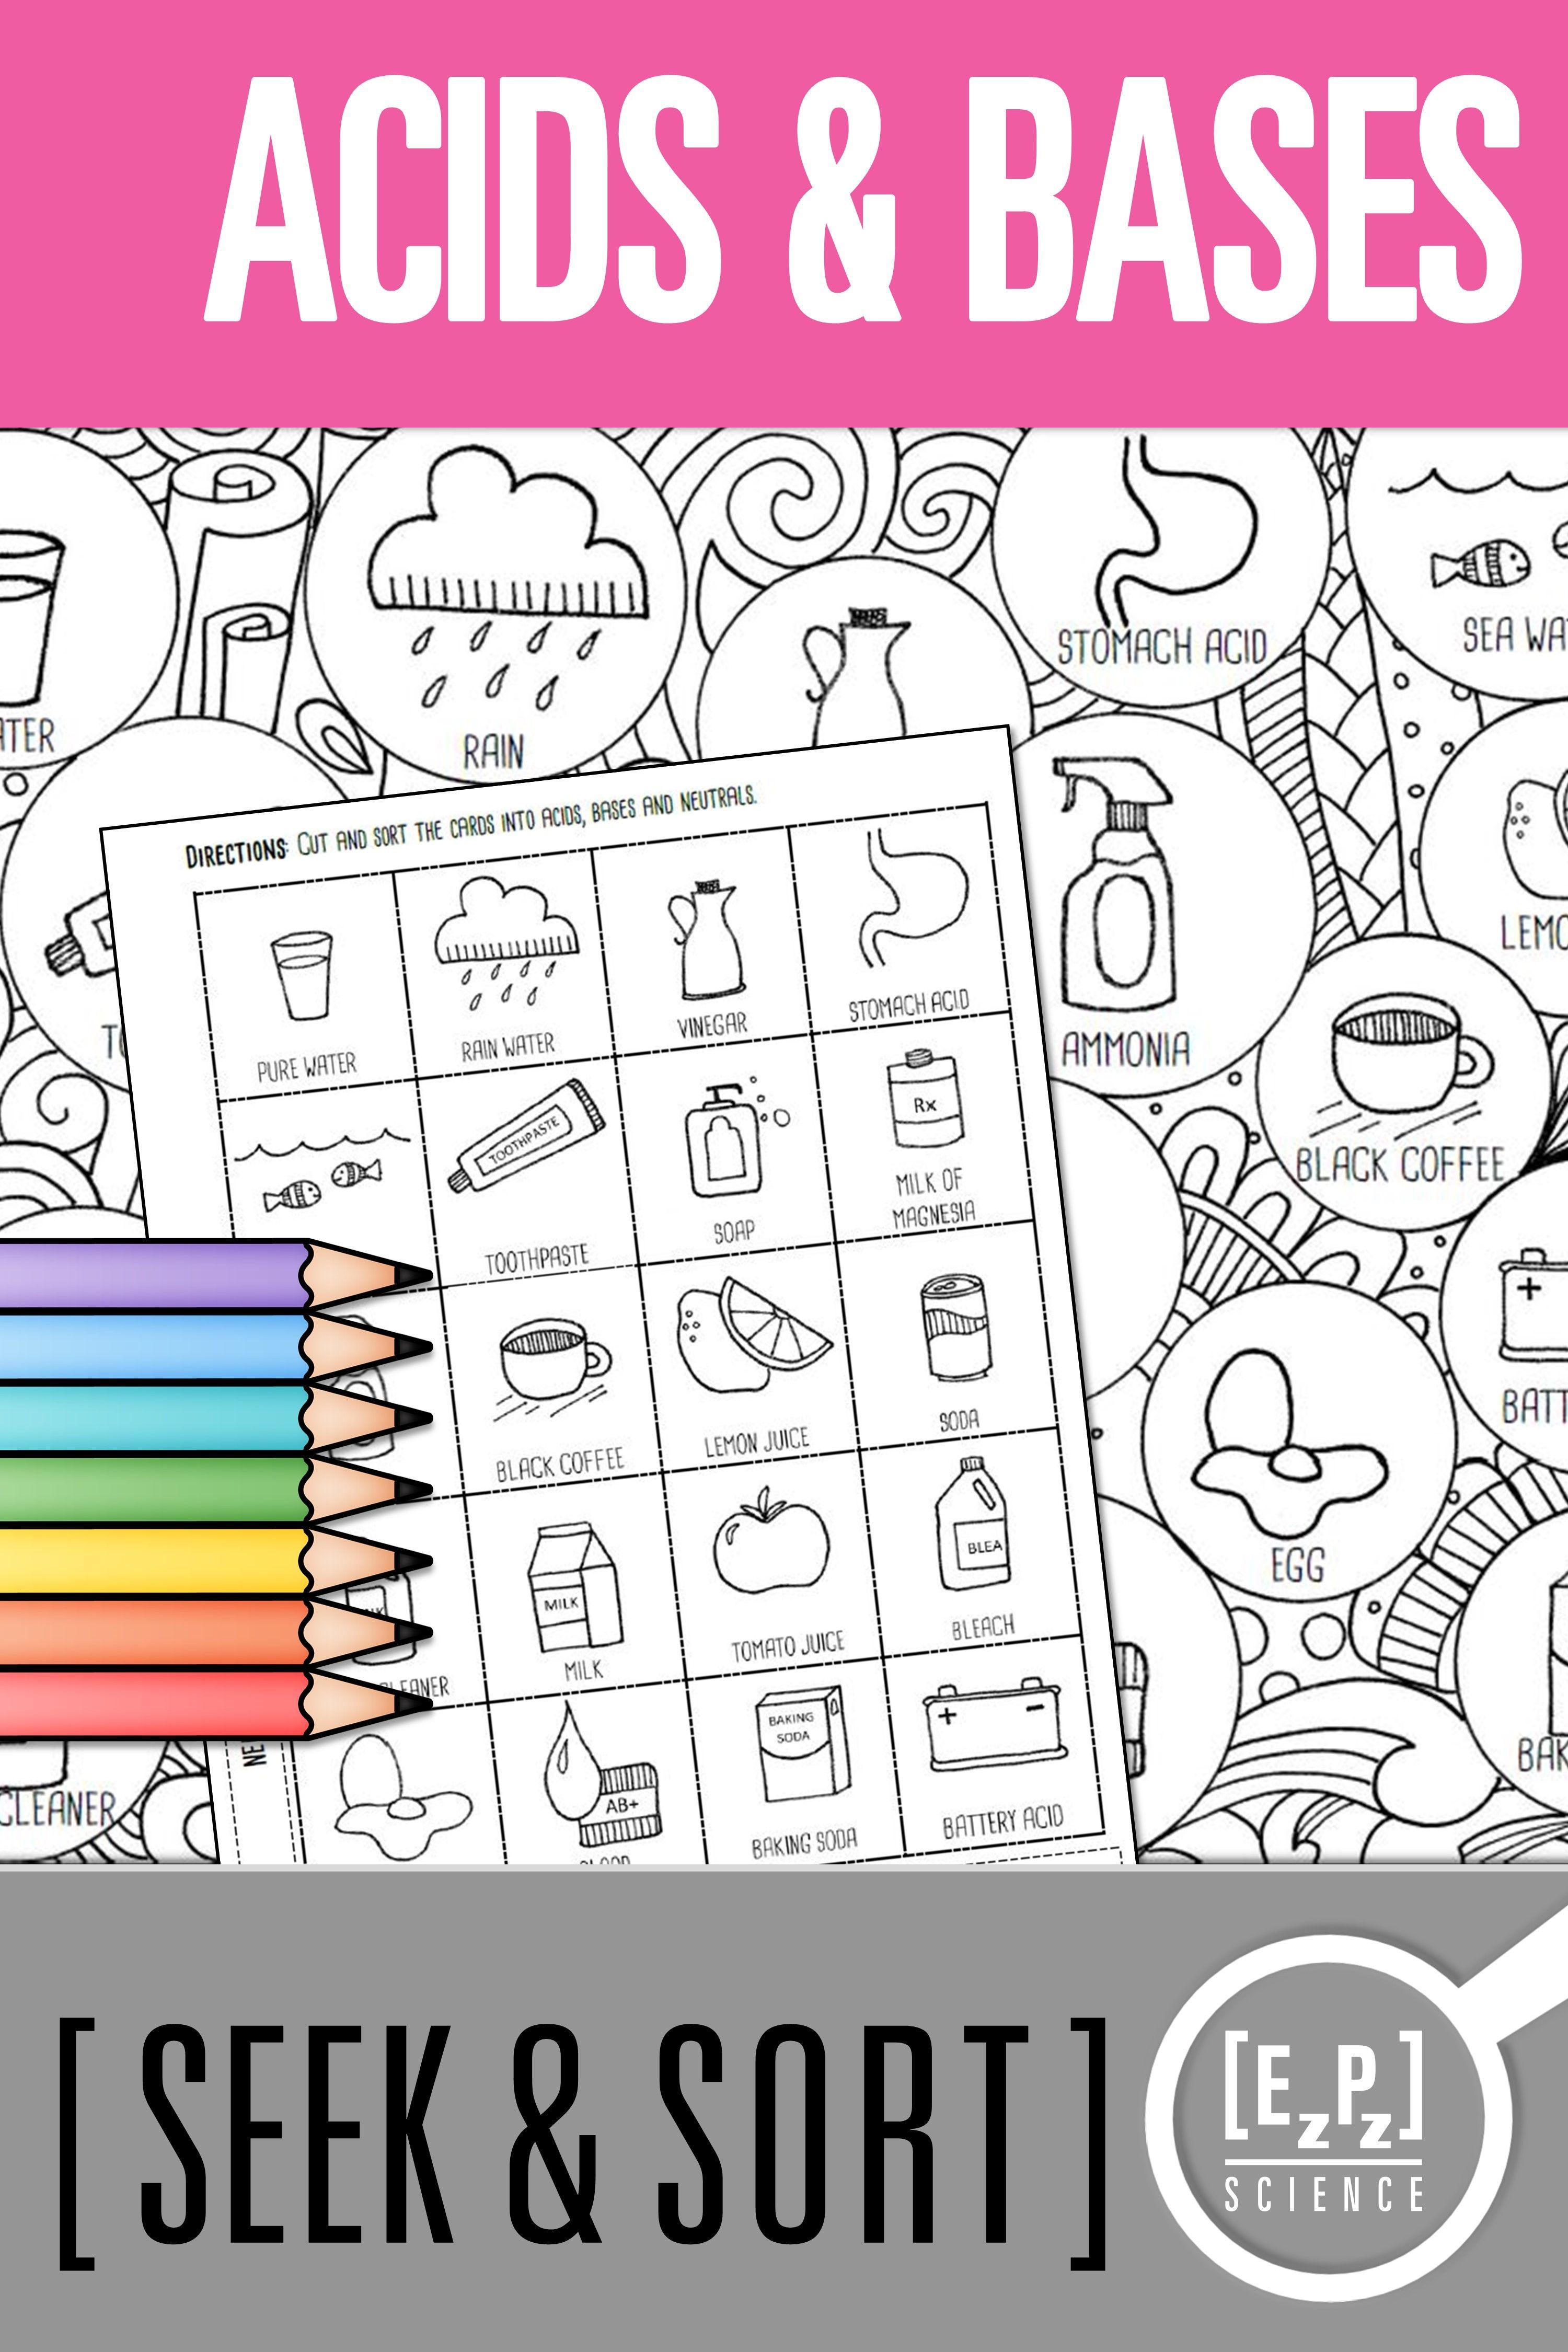 Acids And Bases Seek And Sort Science Doodle Amp Card Sort